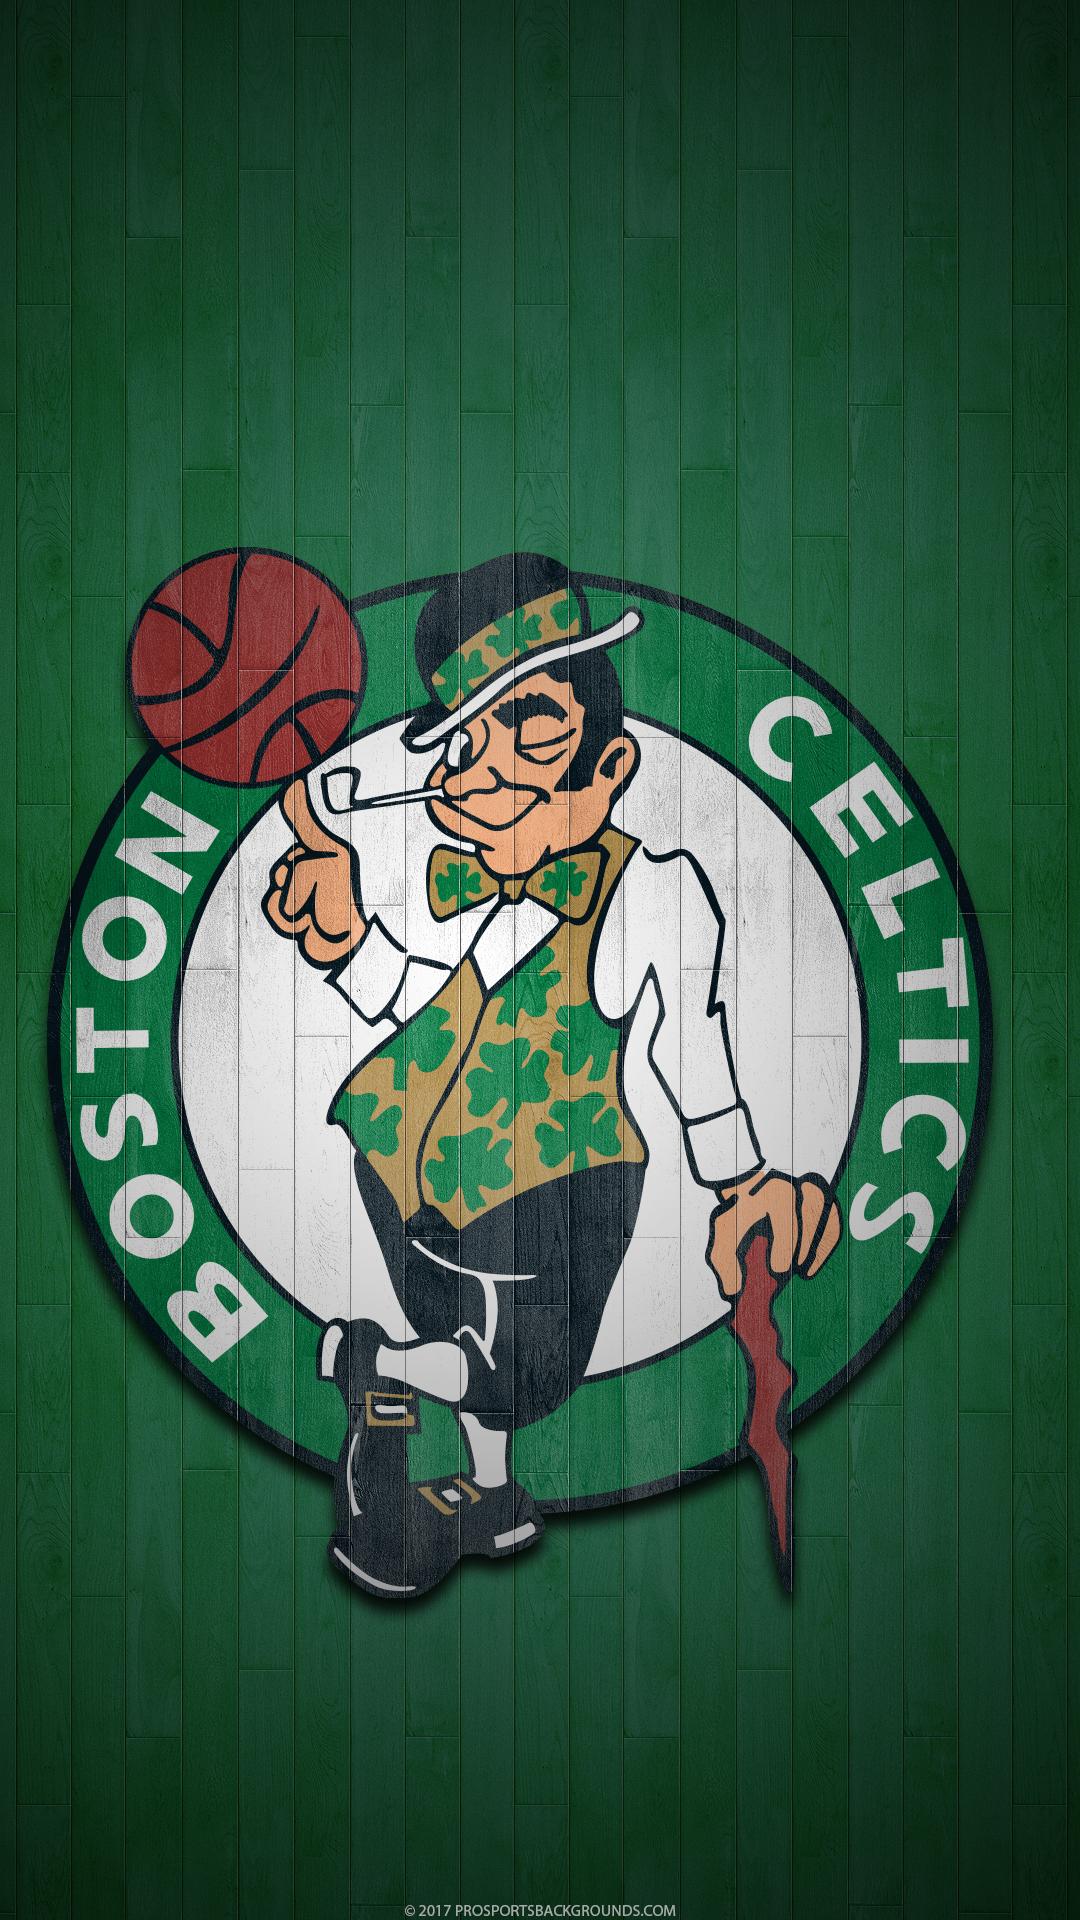 Boston Celtics 2017 Hardwood Wallpaper Mobile 1 Png 1080 1920 Boston Celtics Wallpaper Boston Celtics Logo Boston Celtics